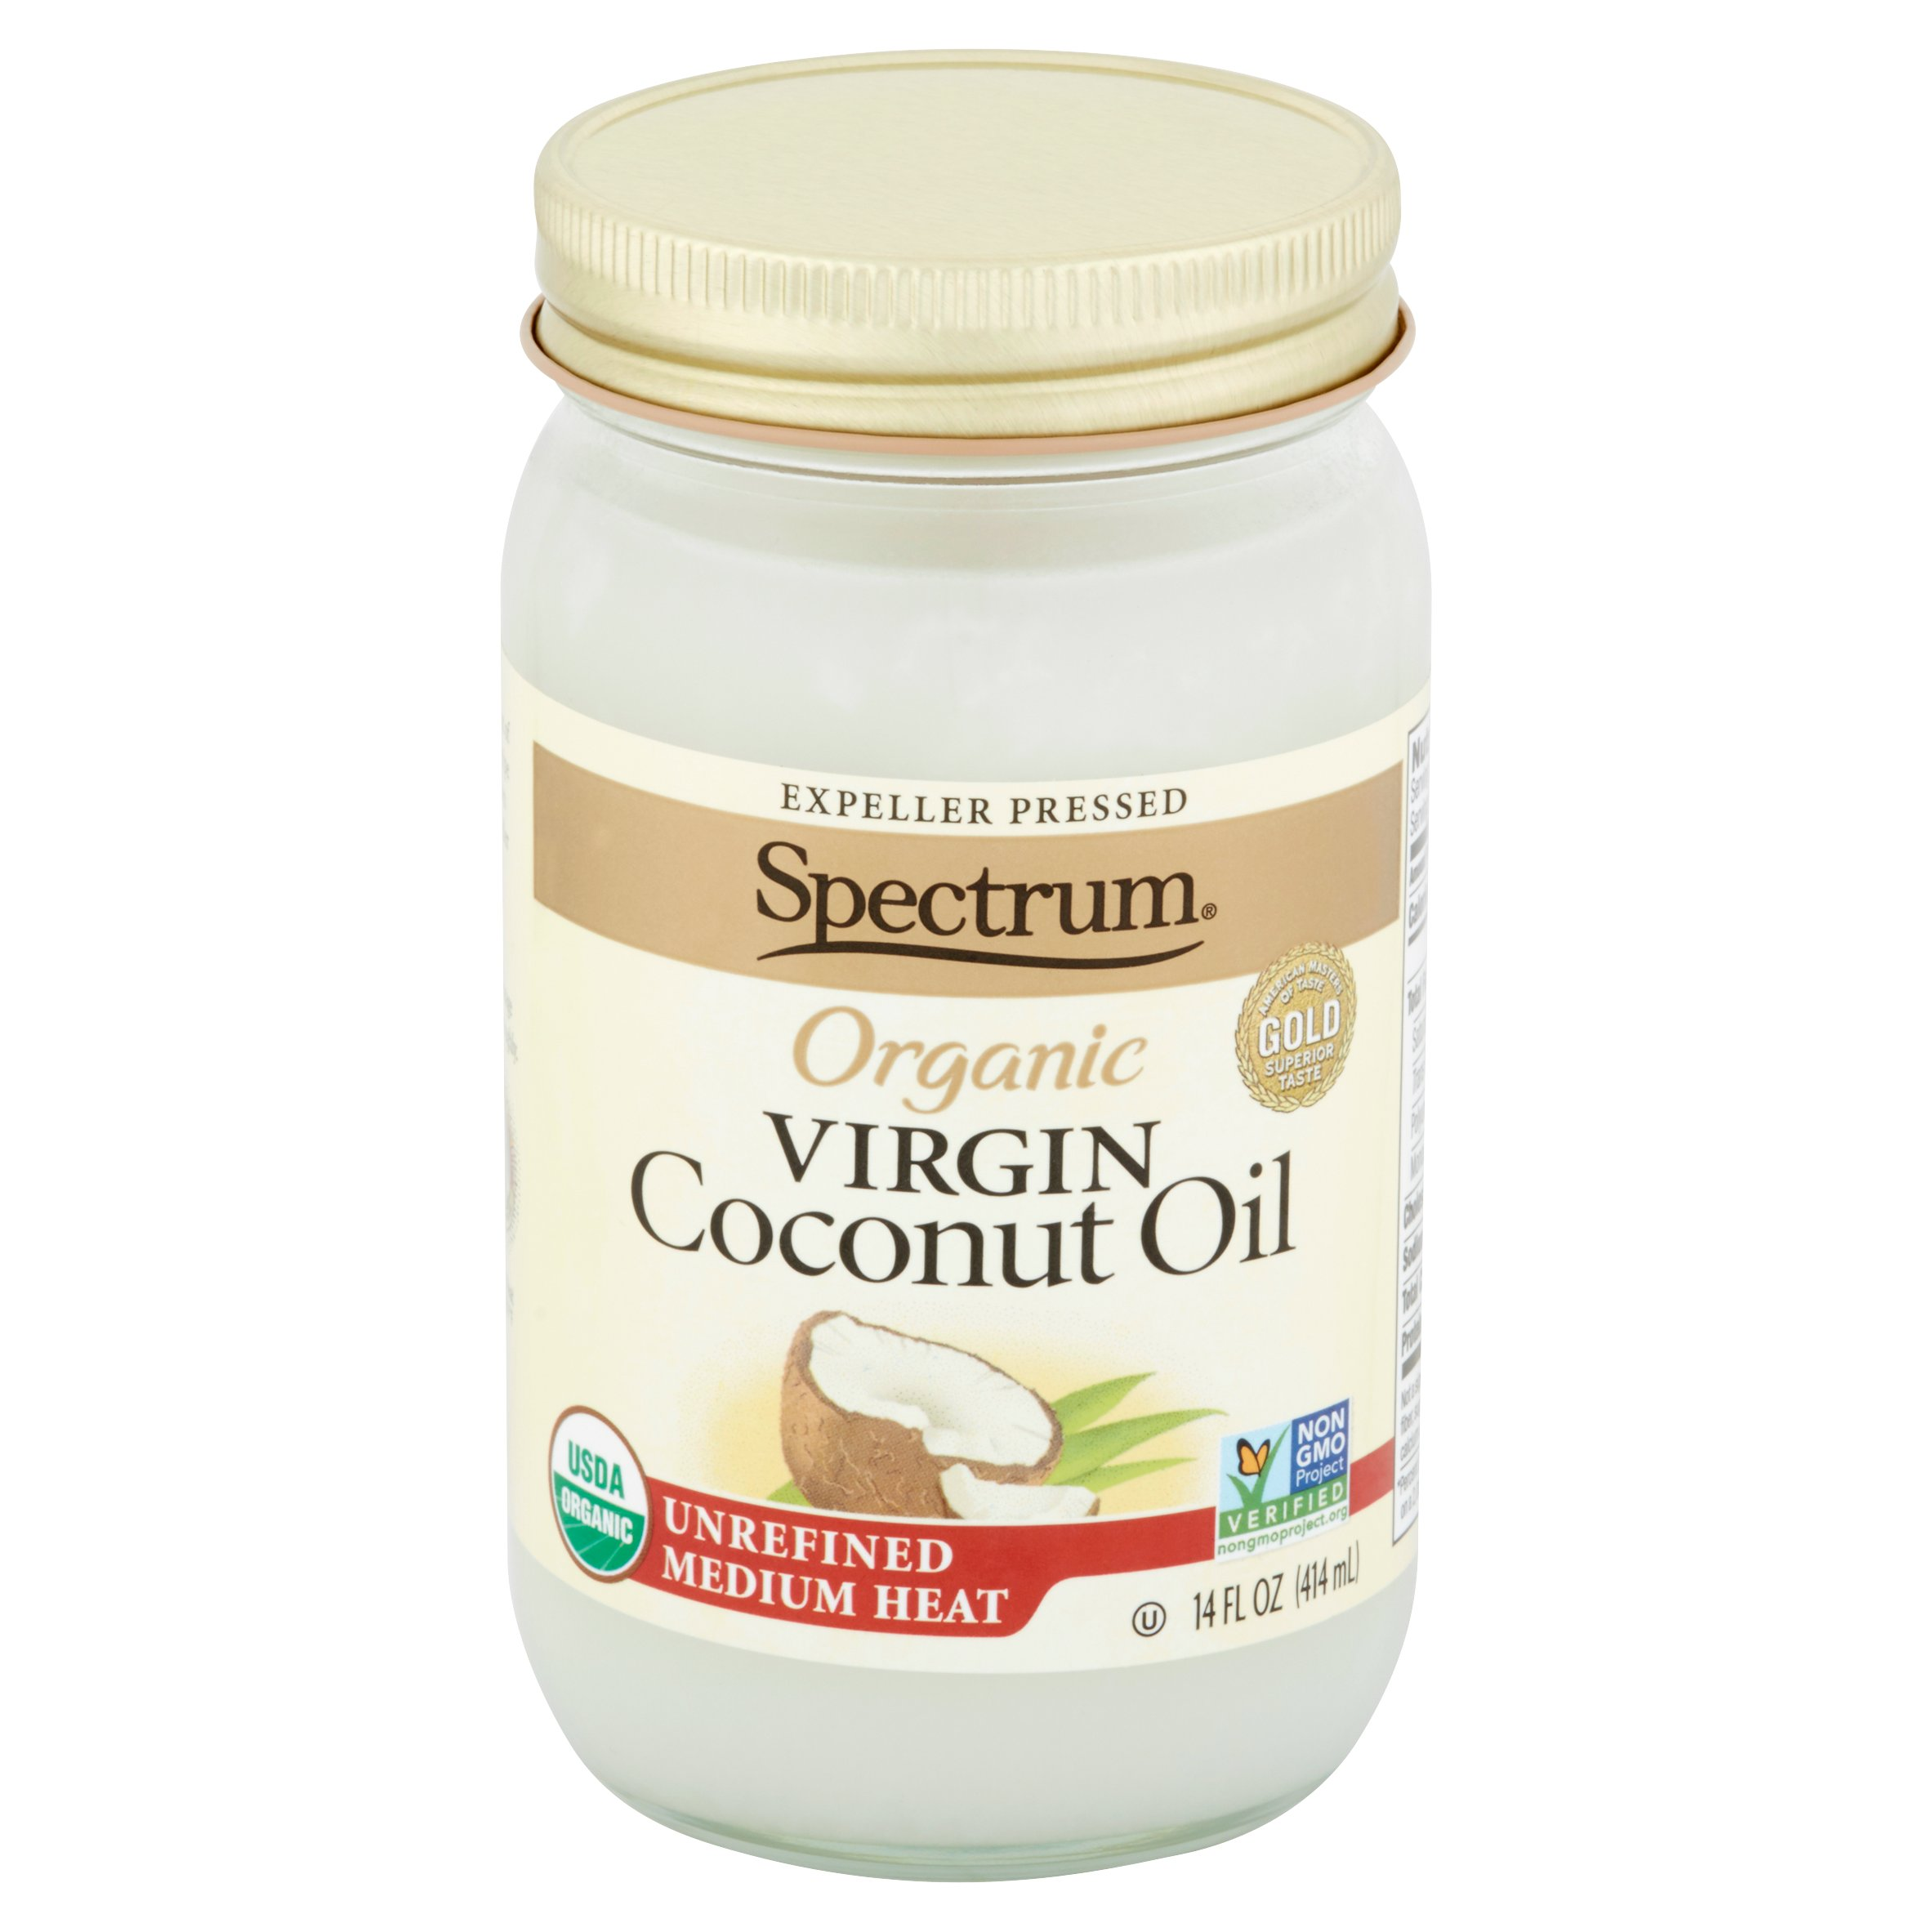 Spectrum Organic Virgin Coconut Oil, 14 fl oz